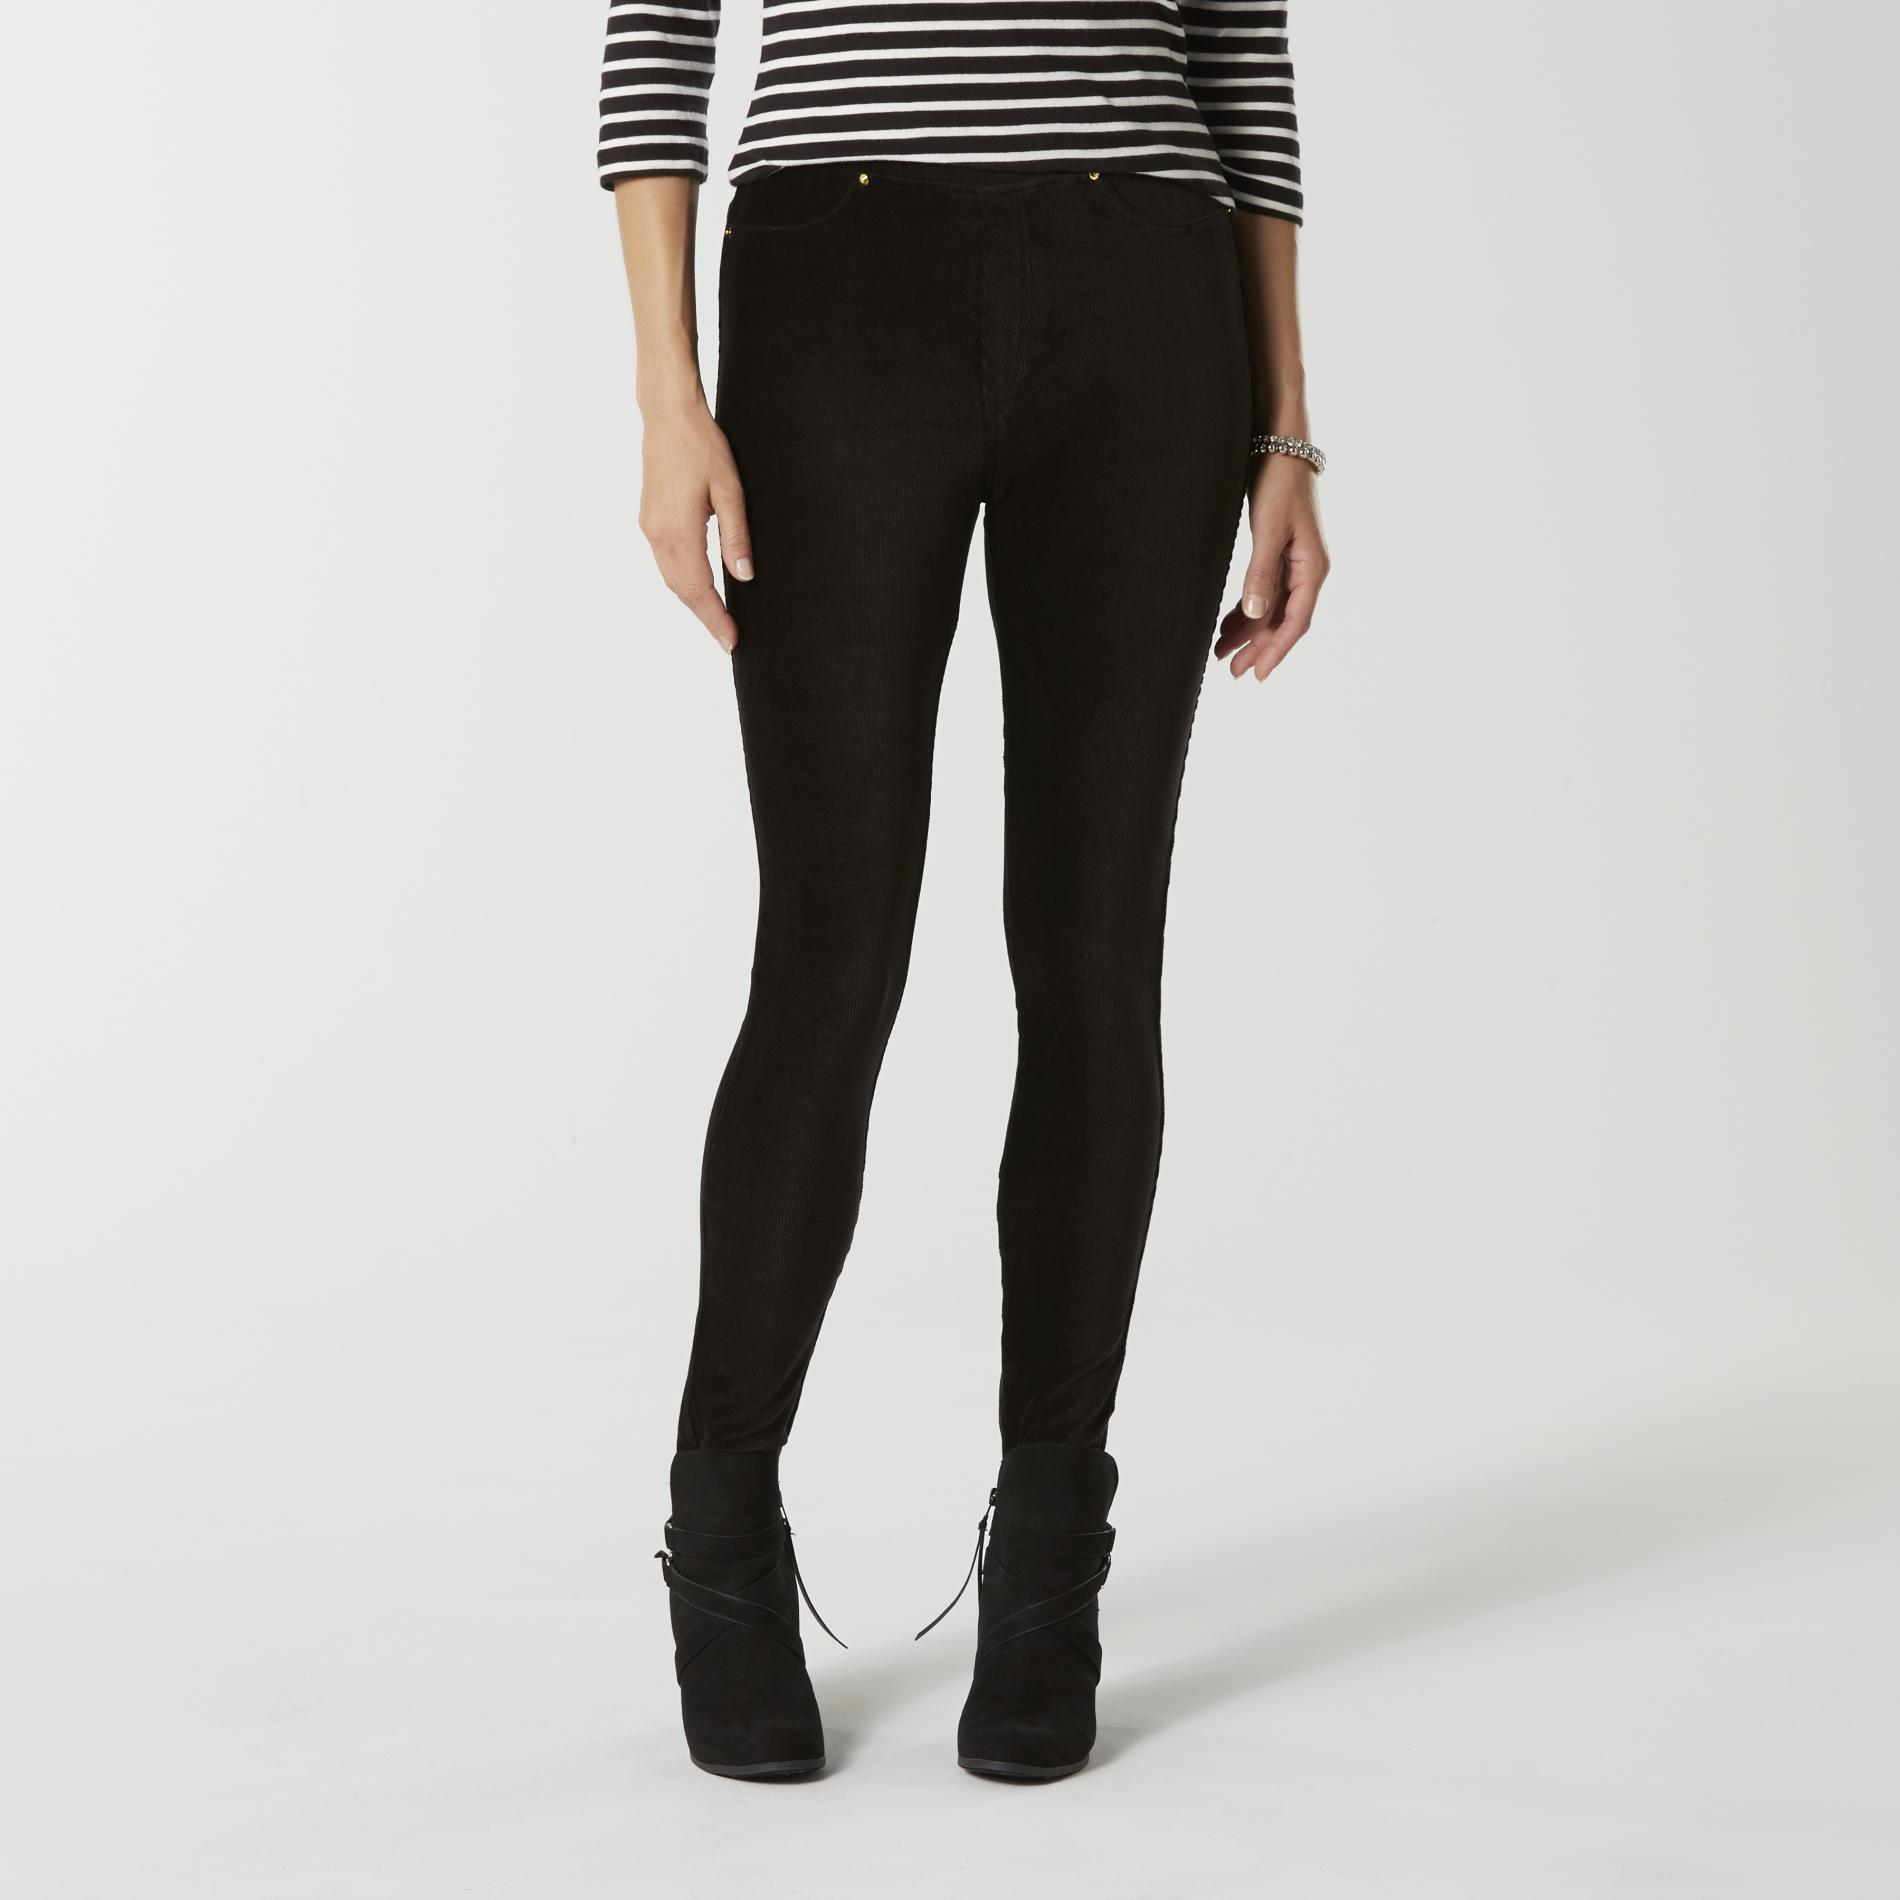 Laura Scott Women' Corduroy Leggings